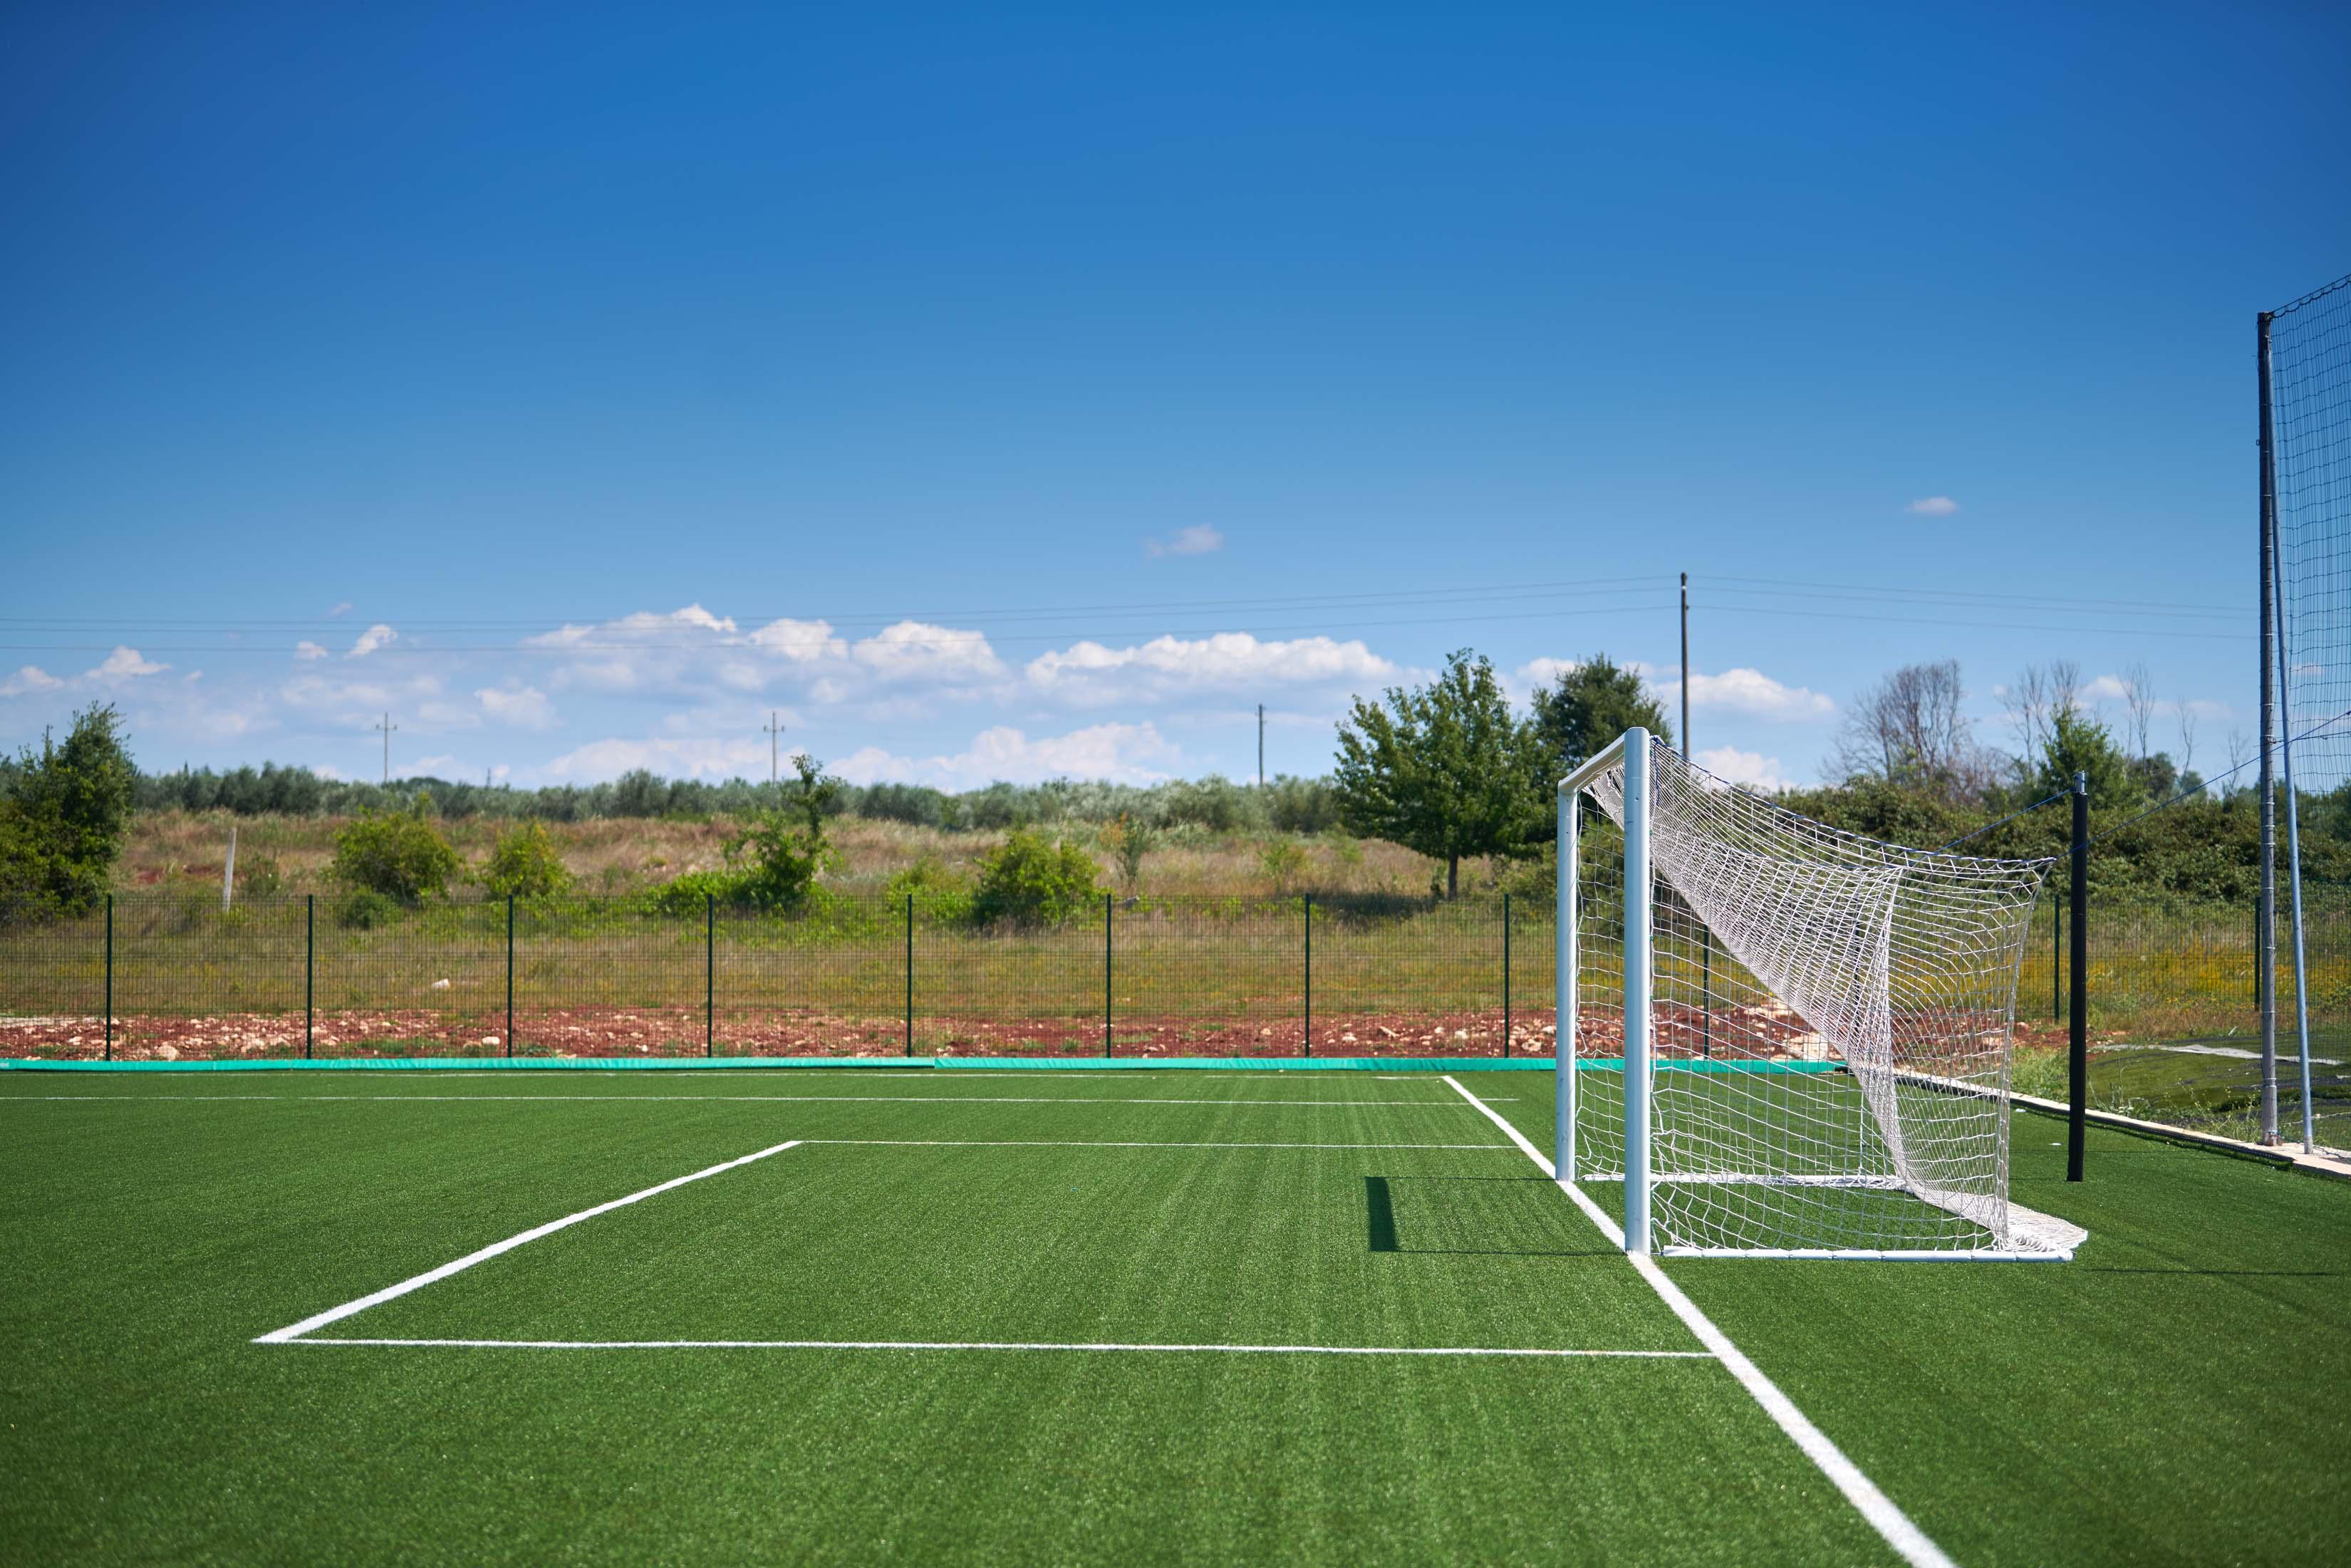 https://cms.satur.sk/data/imgs/tour_image/orig/stella_maris_resort_plava_laguna_2020_sport_facilities_soccer_-2-1800580.jpg